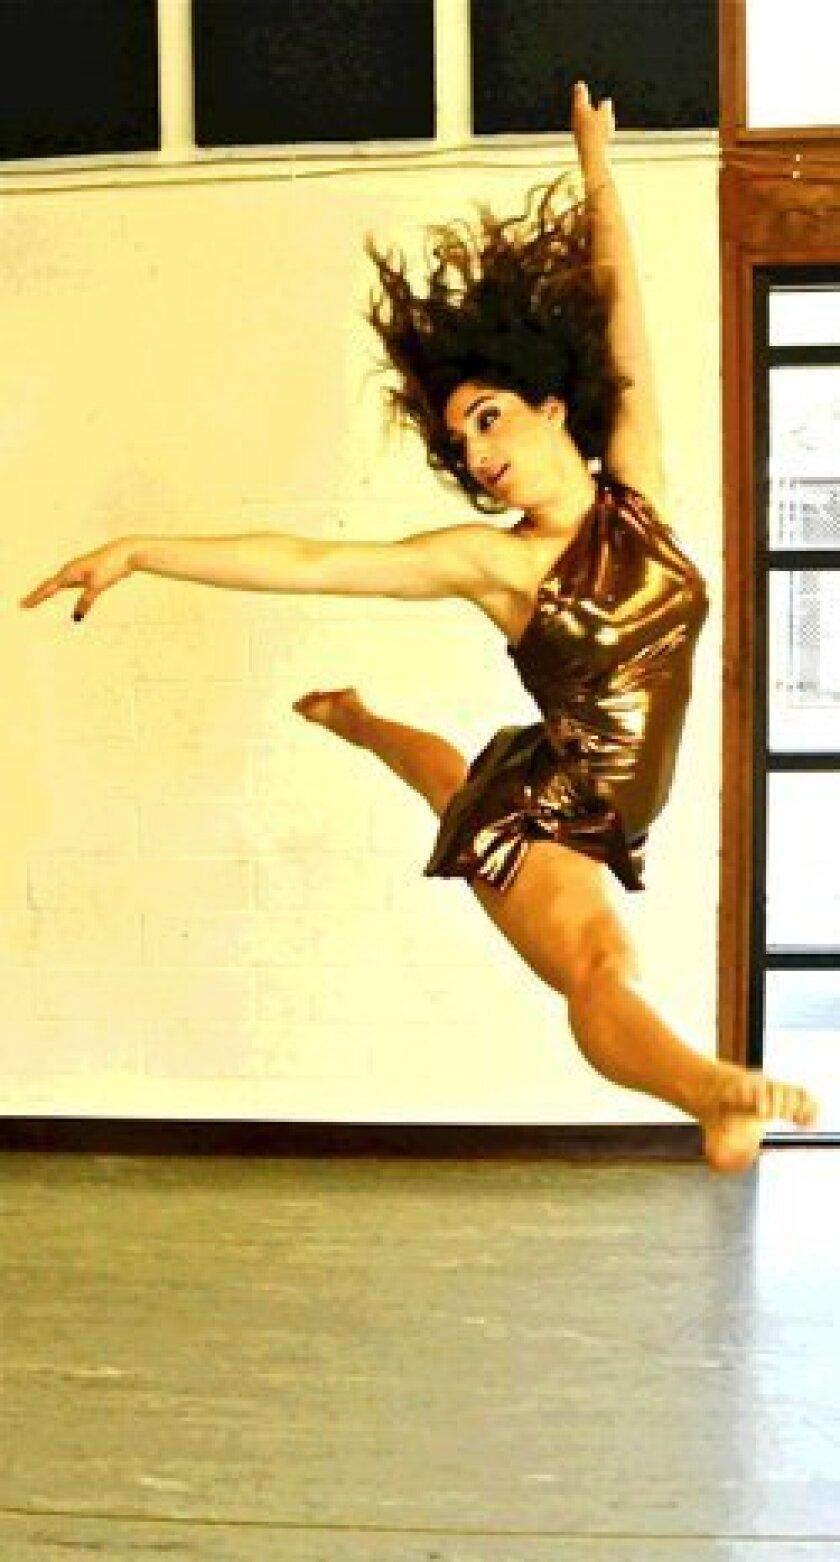 Torrey Pines High School dancer Tara Aftahi